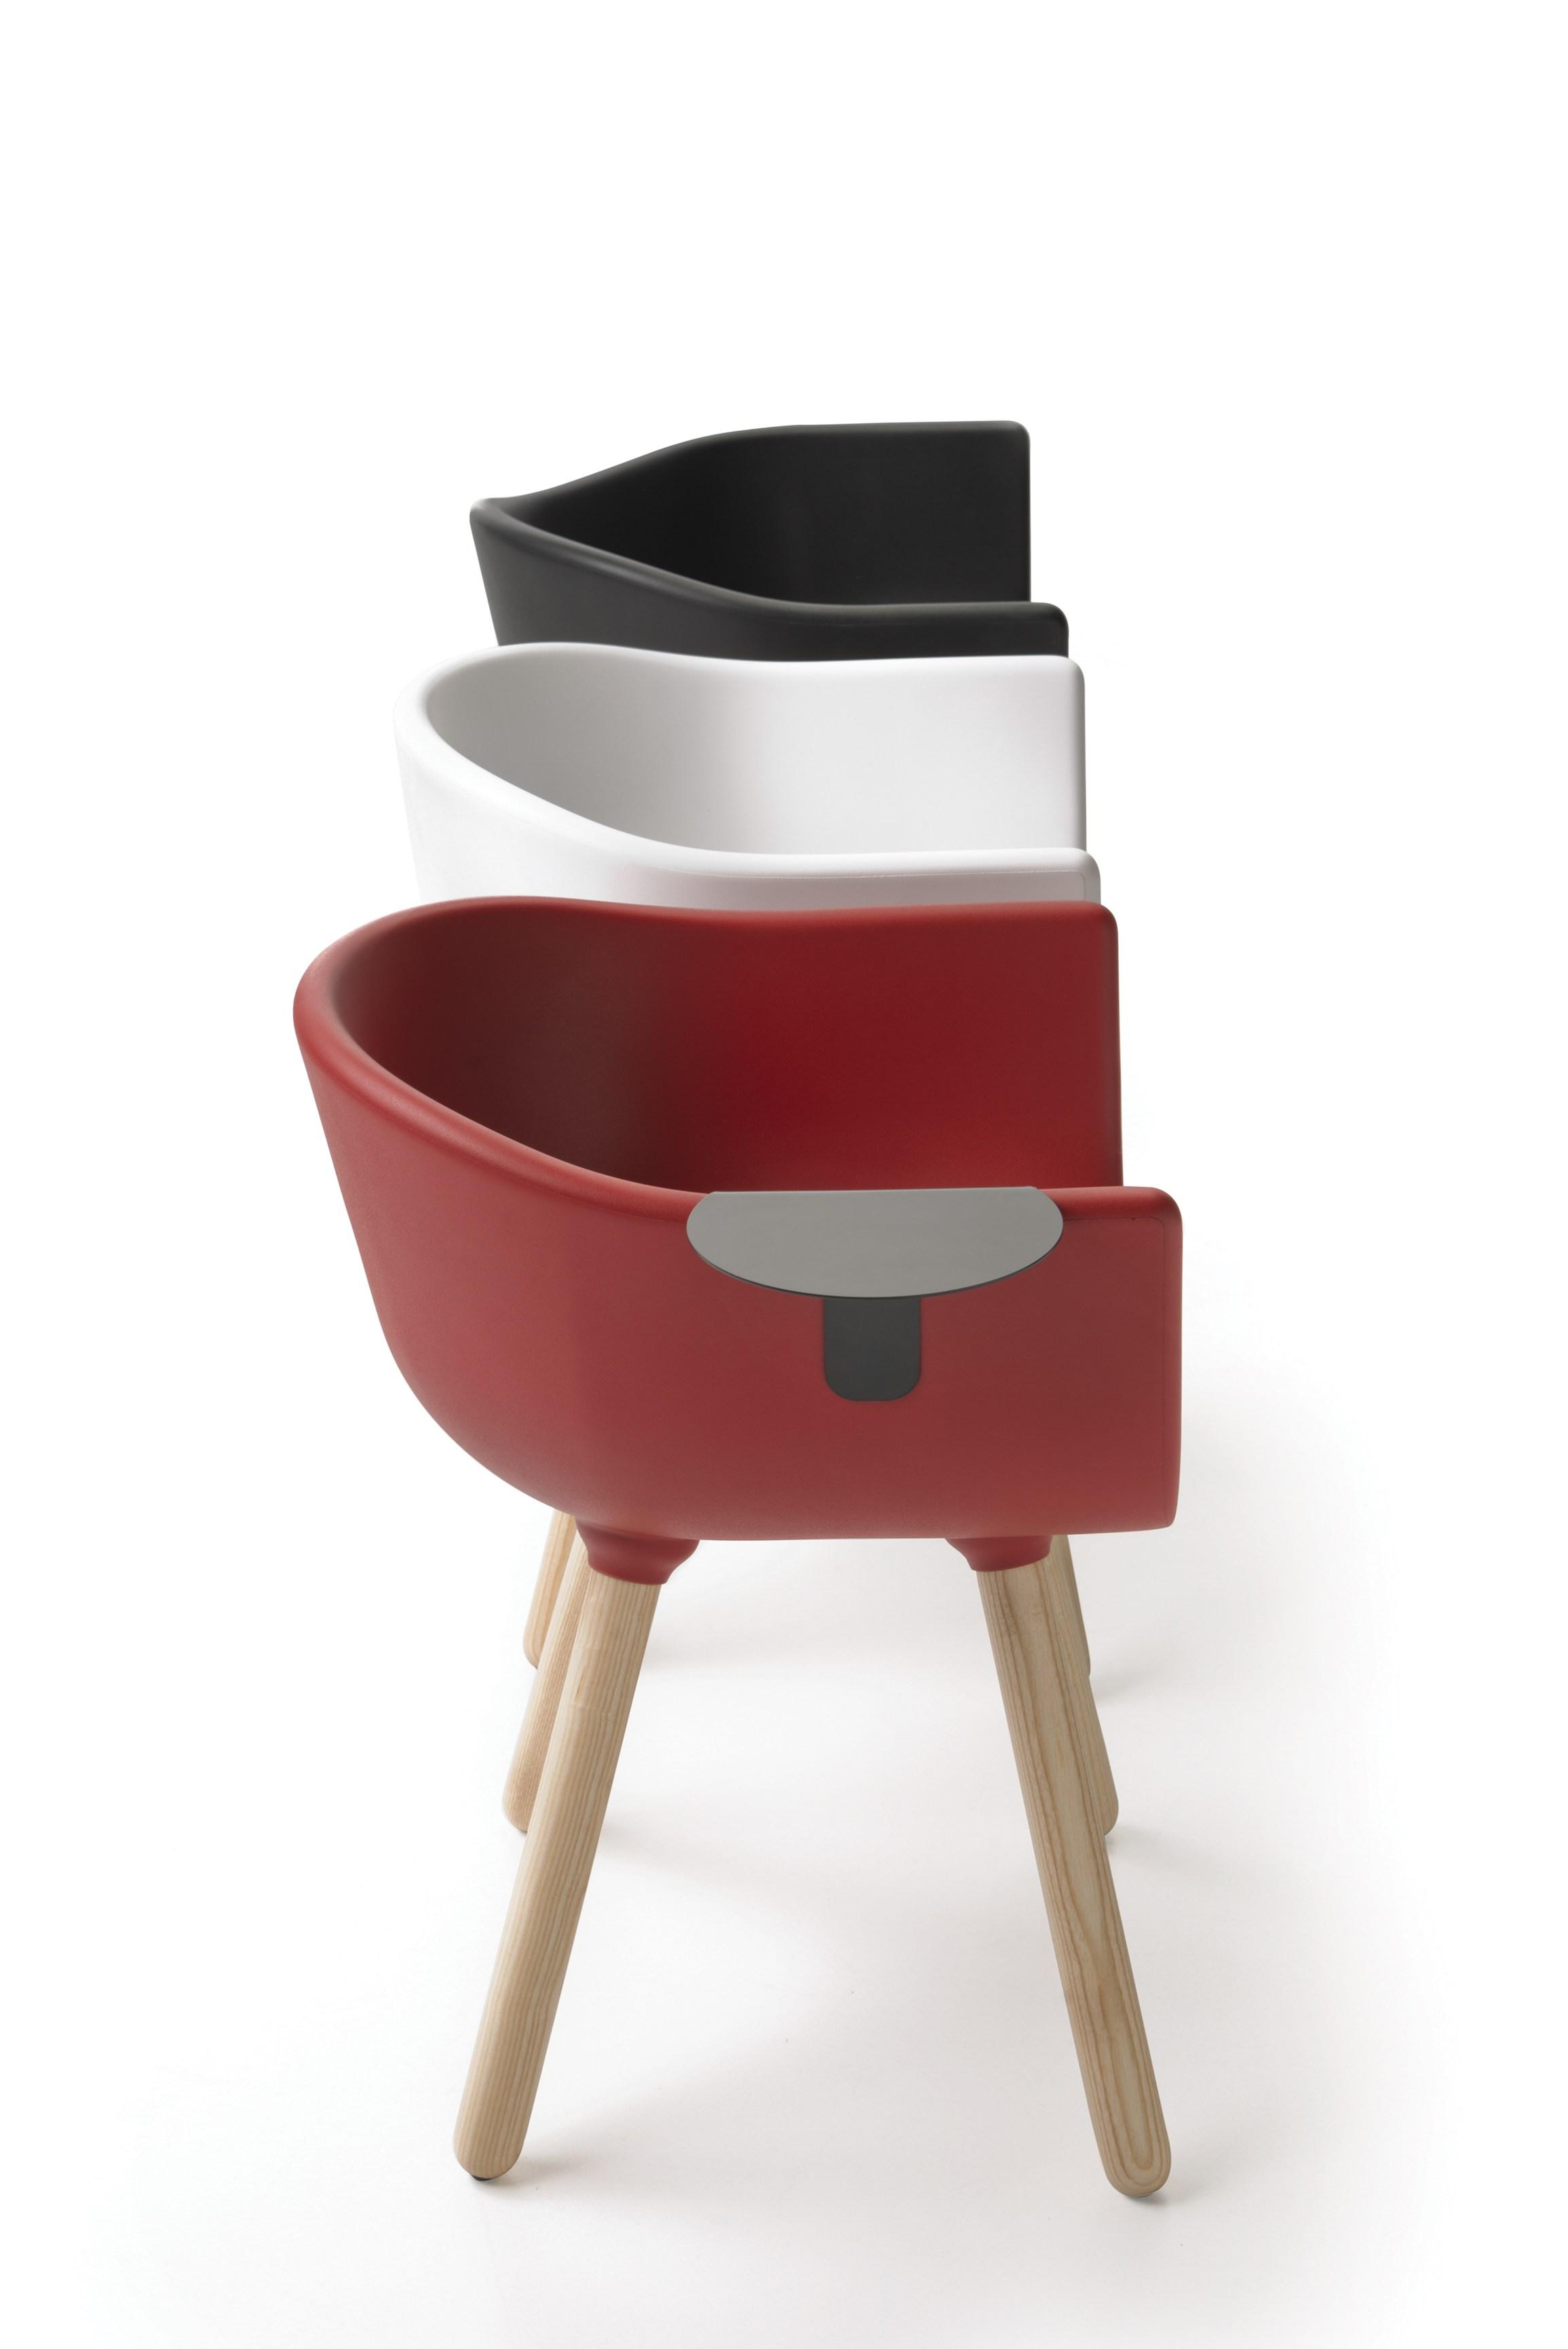 Tulip Chair by Kazuko Okamoto for Chairs & More